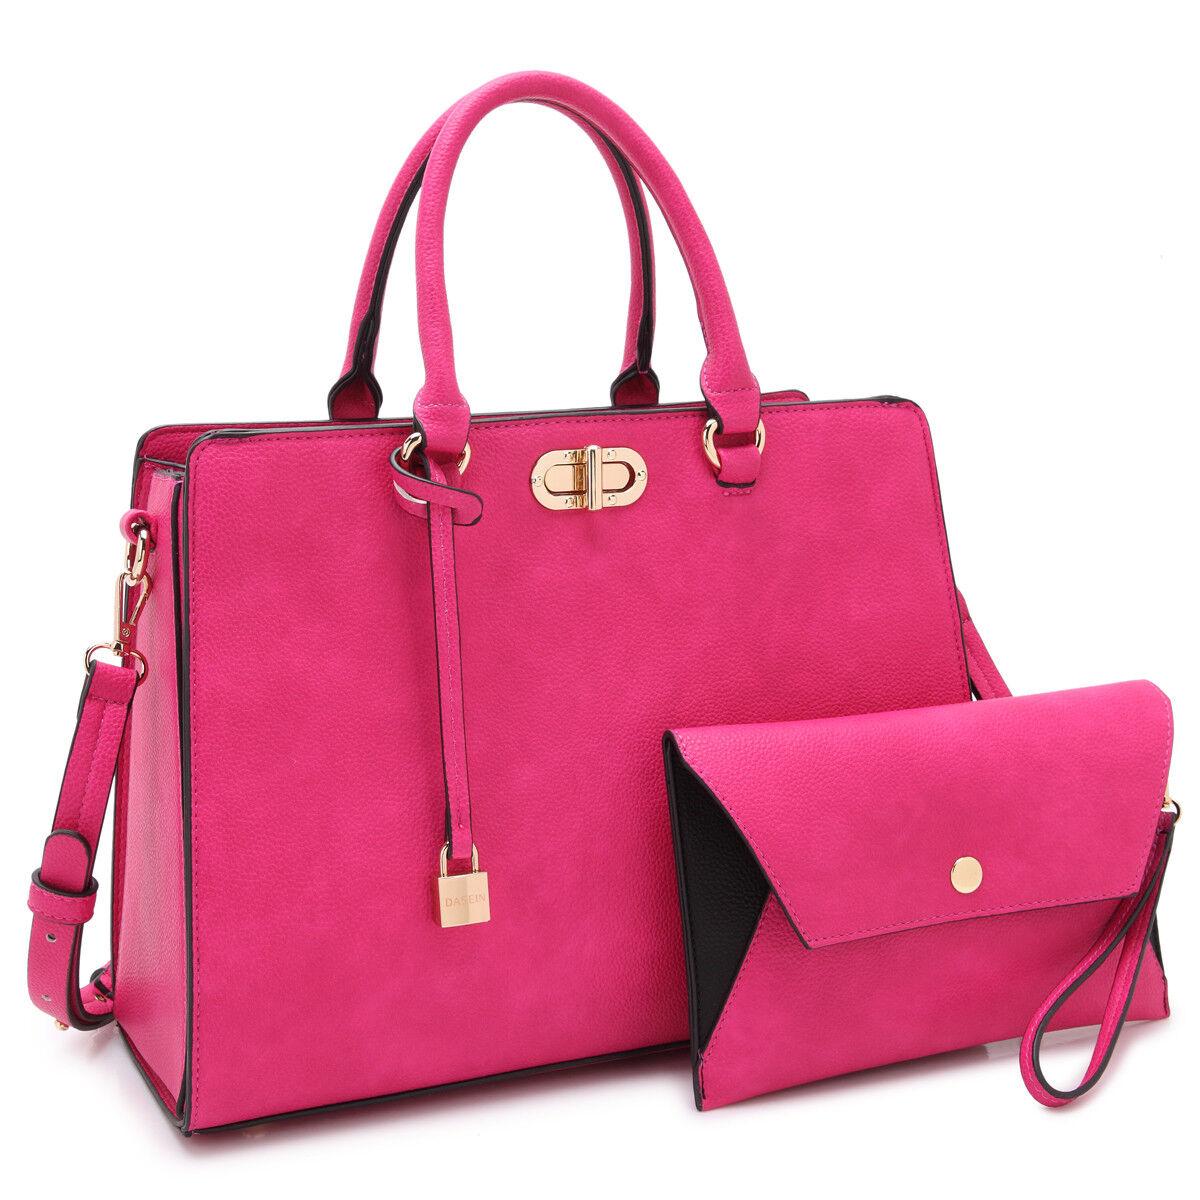 Dasein Women Handbag Faux Leather Satchel Tote Shoulder Bag